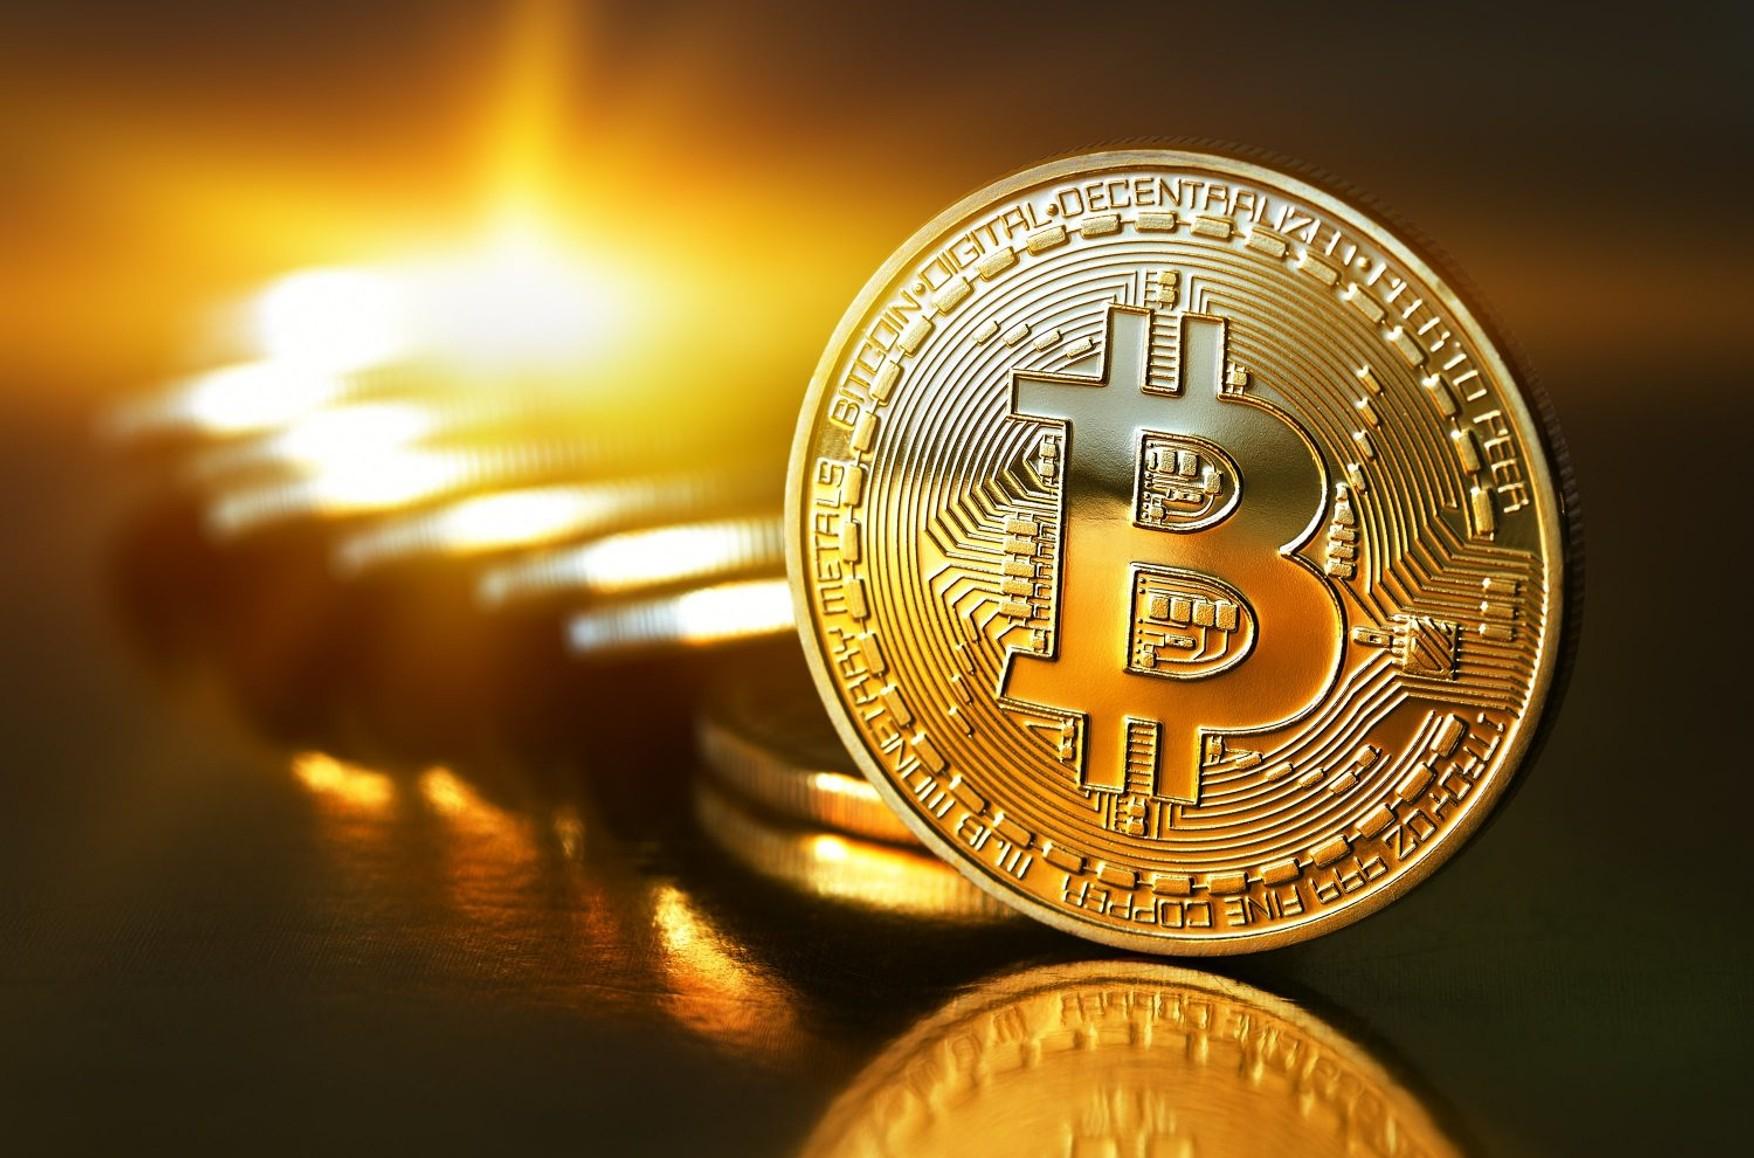 Майк Новограц: капитализация биткоина непременно достигнет показателя золота